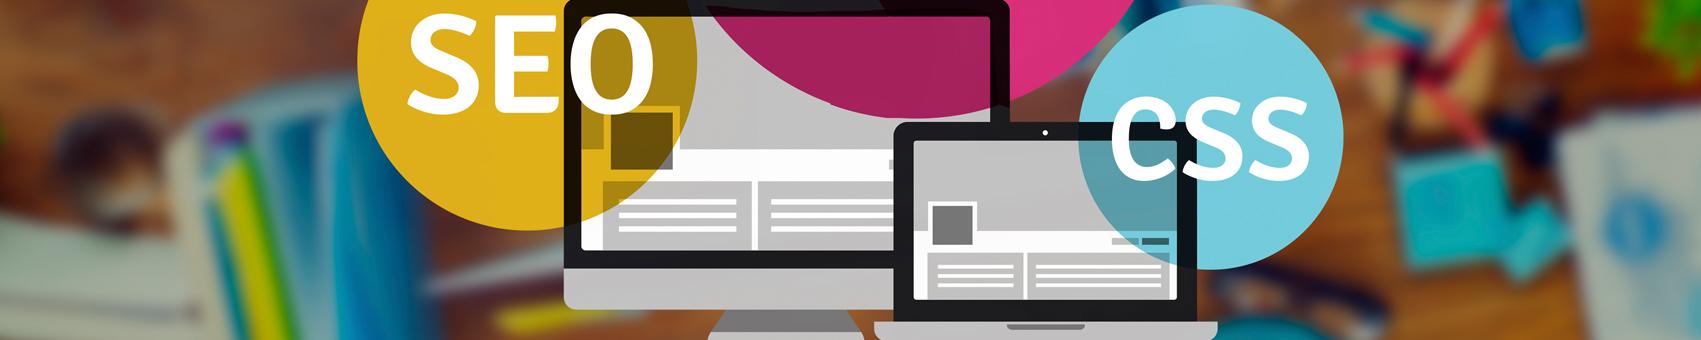 egitimler-bursa-web-tasarim-kursu